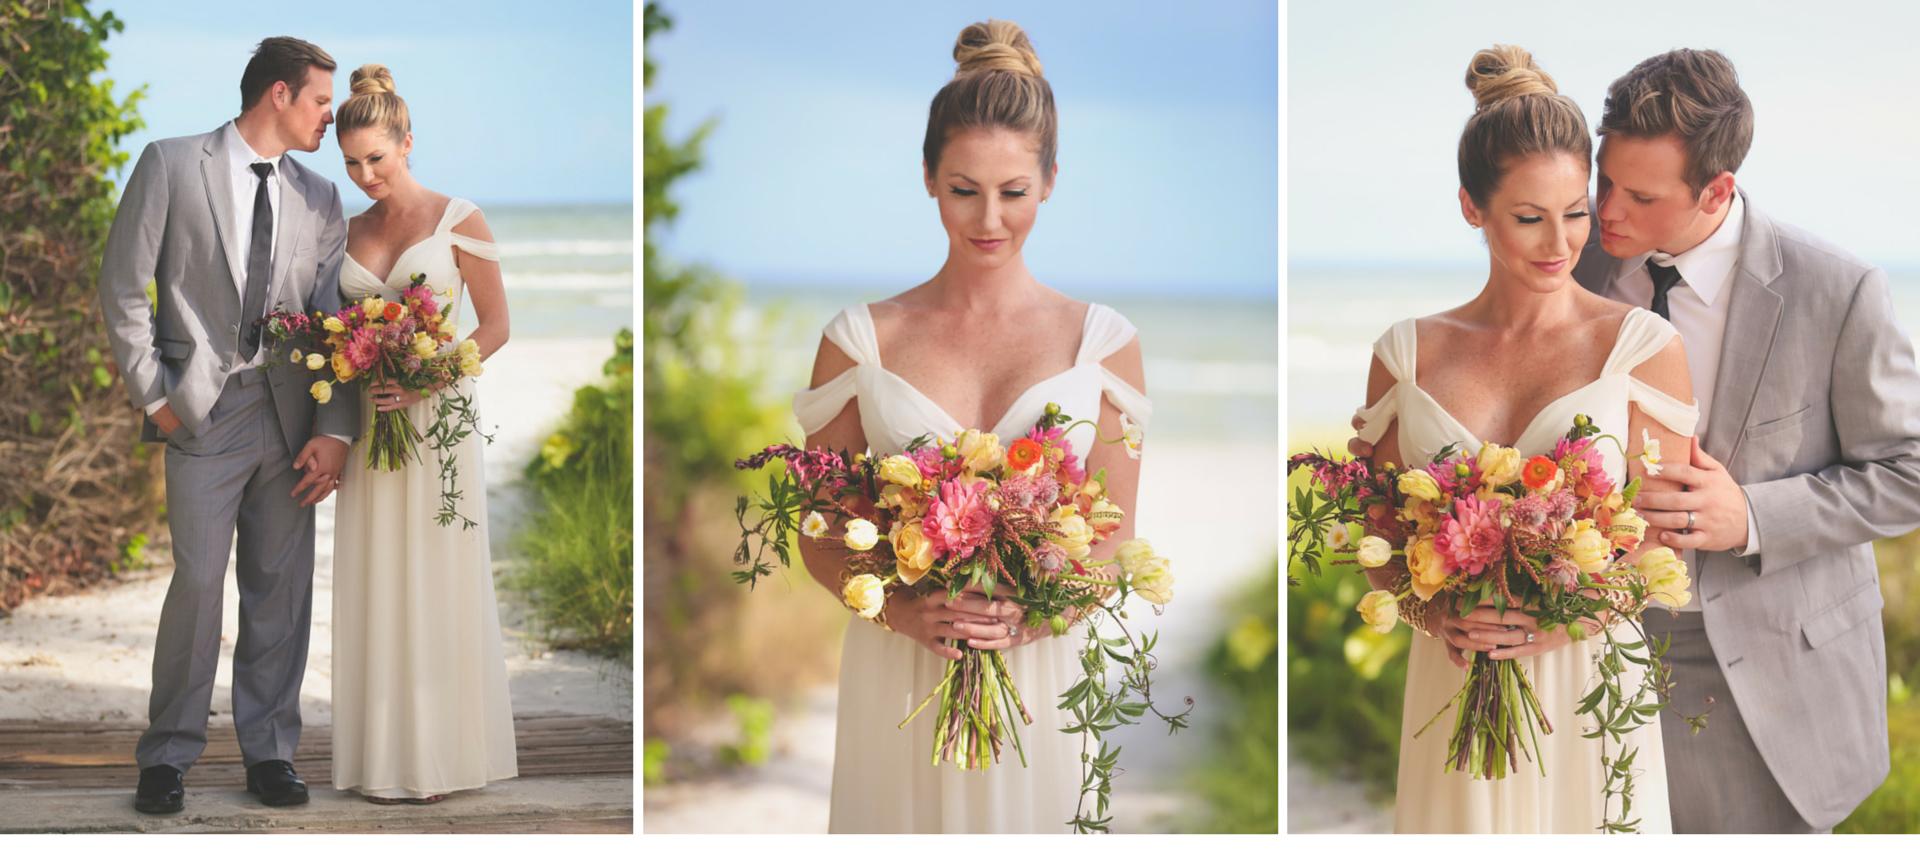 Painted On Wedding Dress Wedding Dresses Dressesss